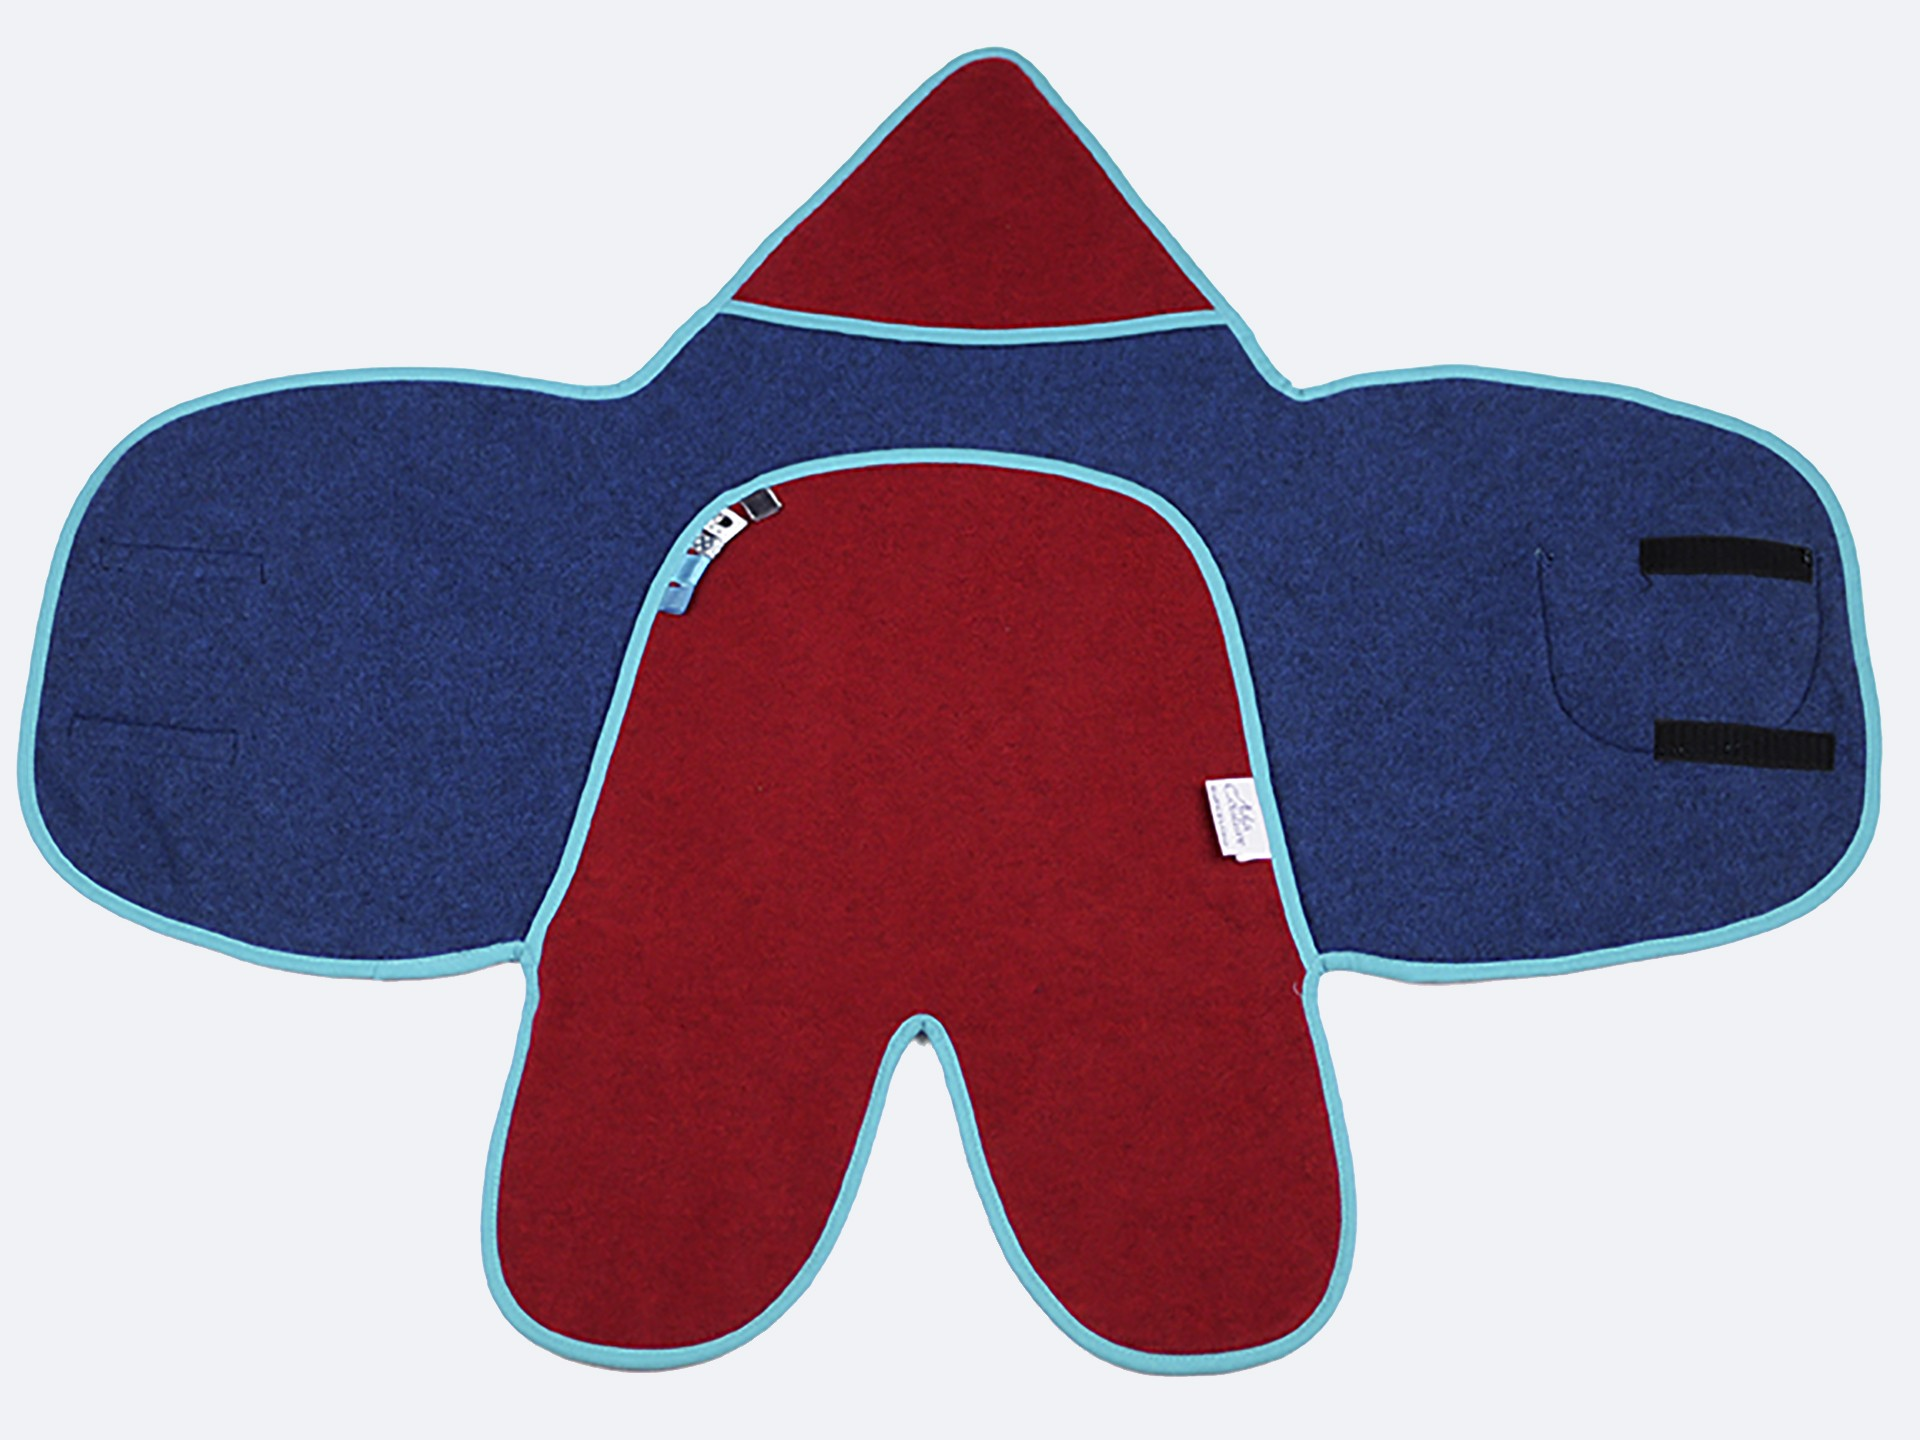 Pim-Pam azul y rojo